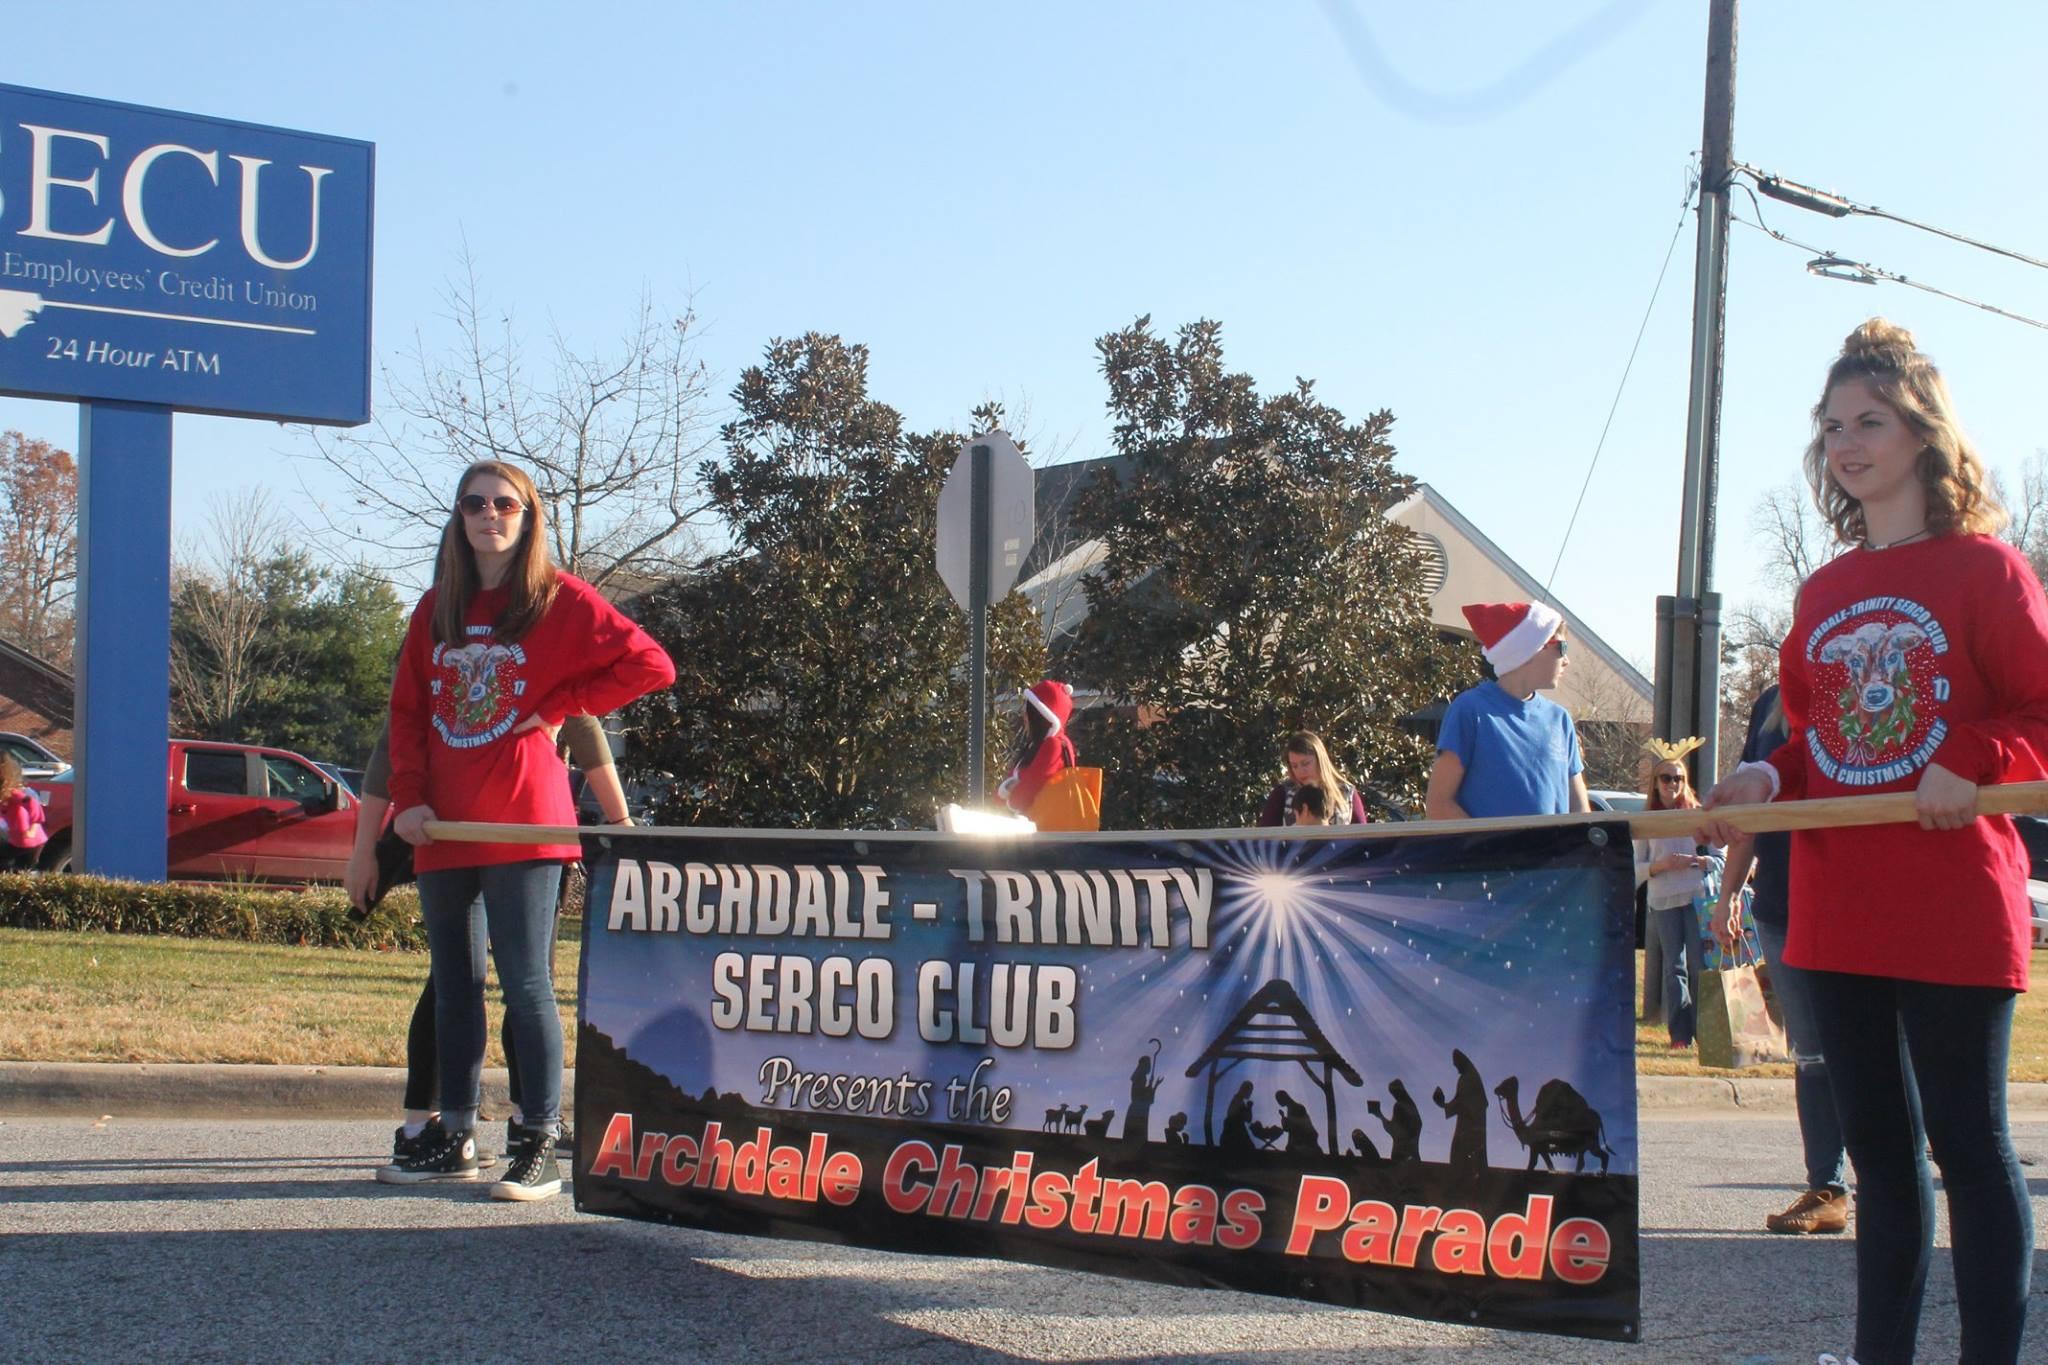 Archdale Christmas Parade 2019 Archdale Christmas Parade